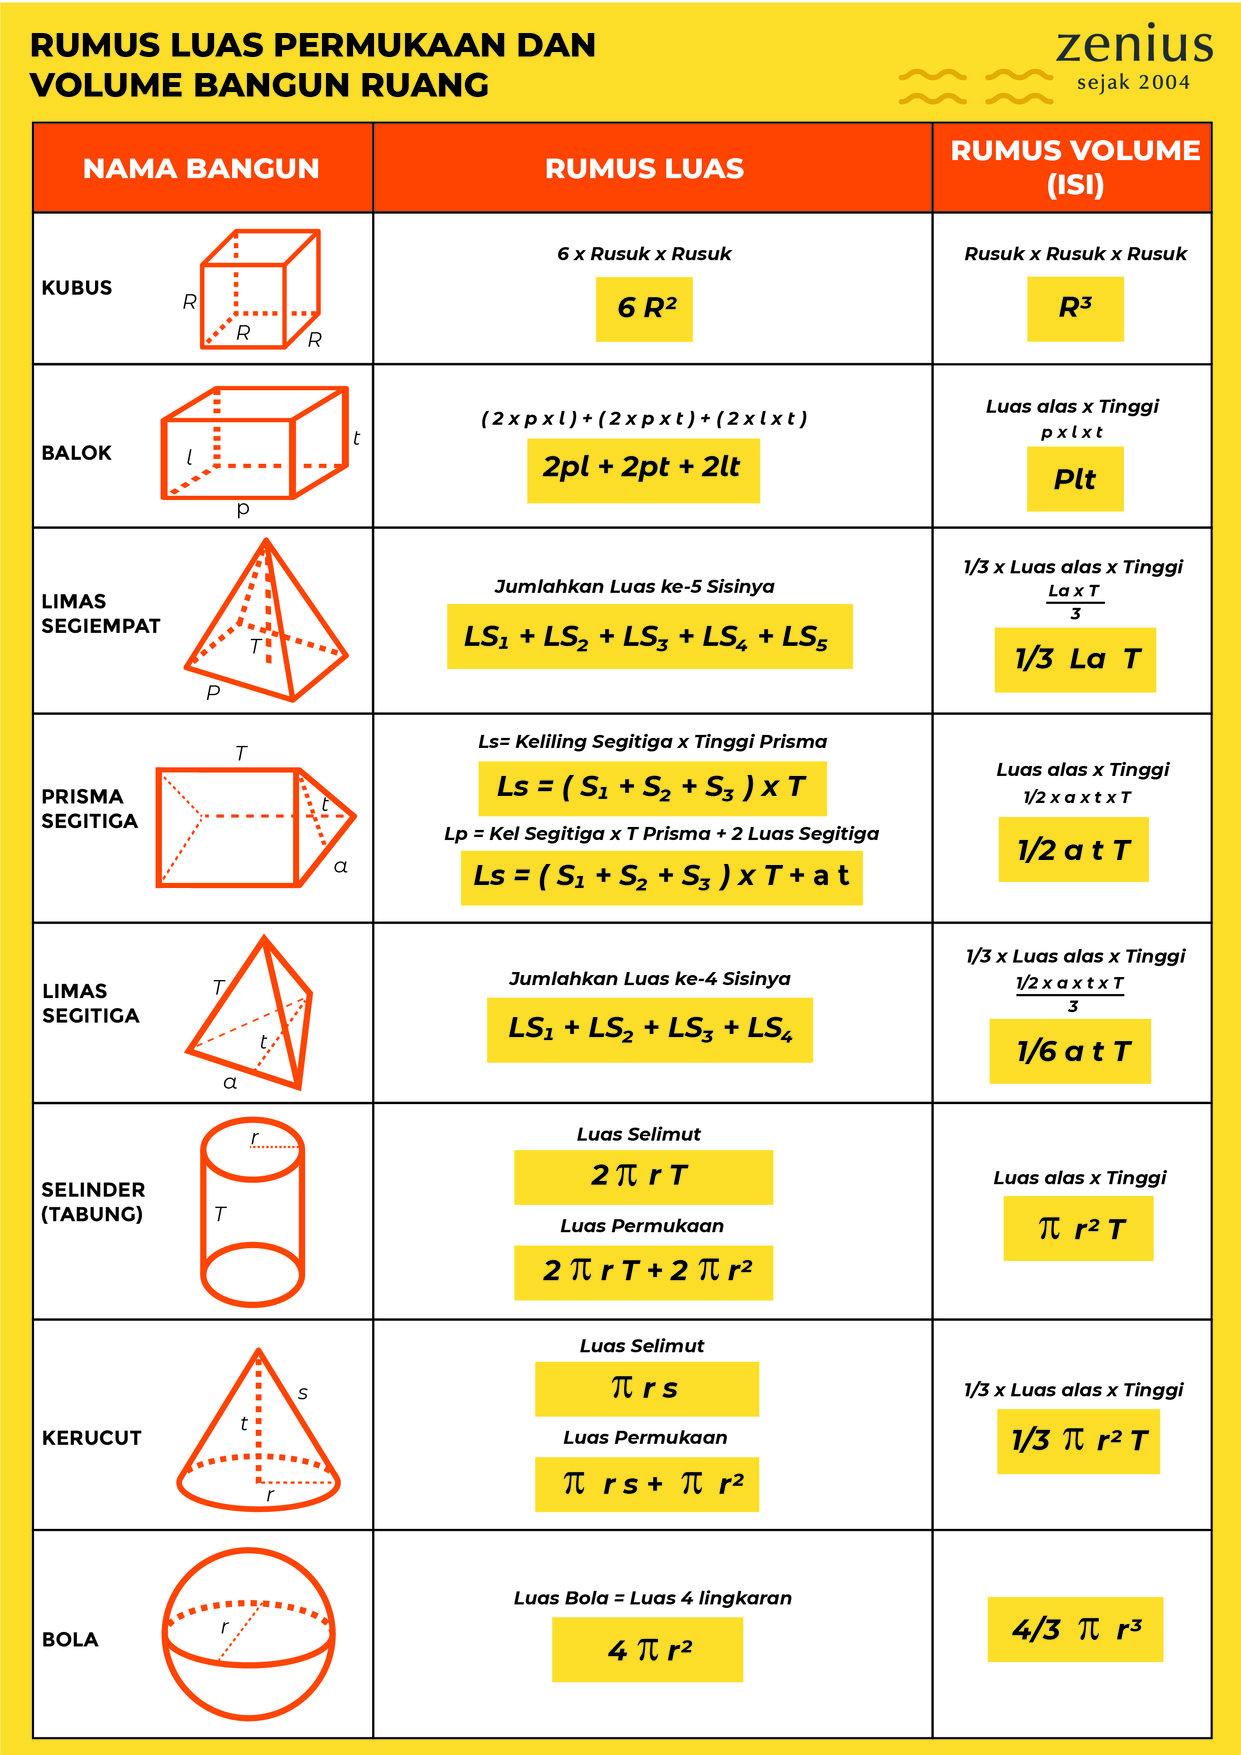 Soal matematika kelas 2 sd tentang pegurangan, penjumlahan, perkalian dan pembagian.full description. Kumpulan Rumus Matematika Lengkap Dengan Keterangannya